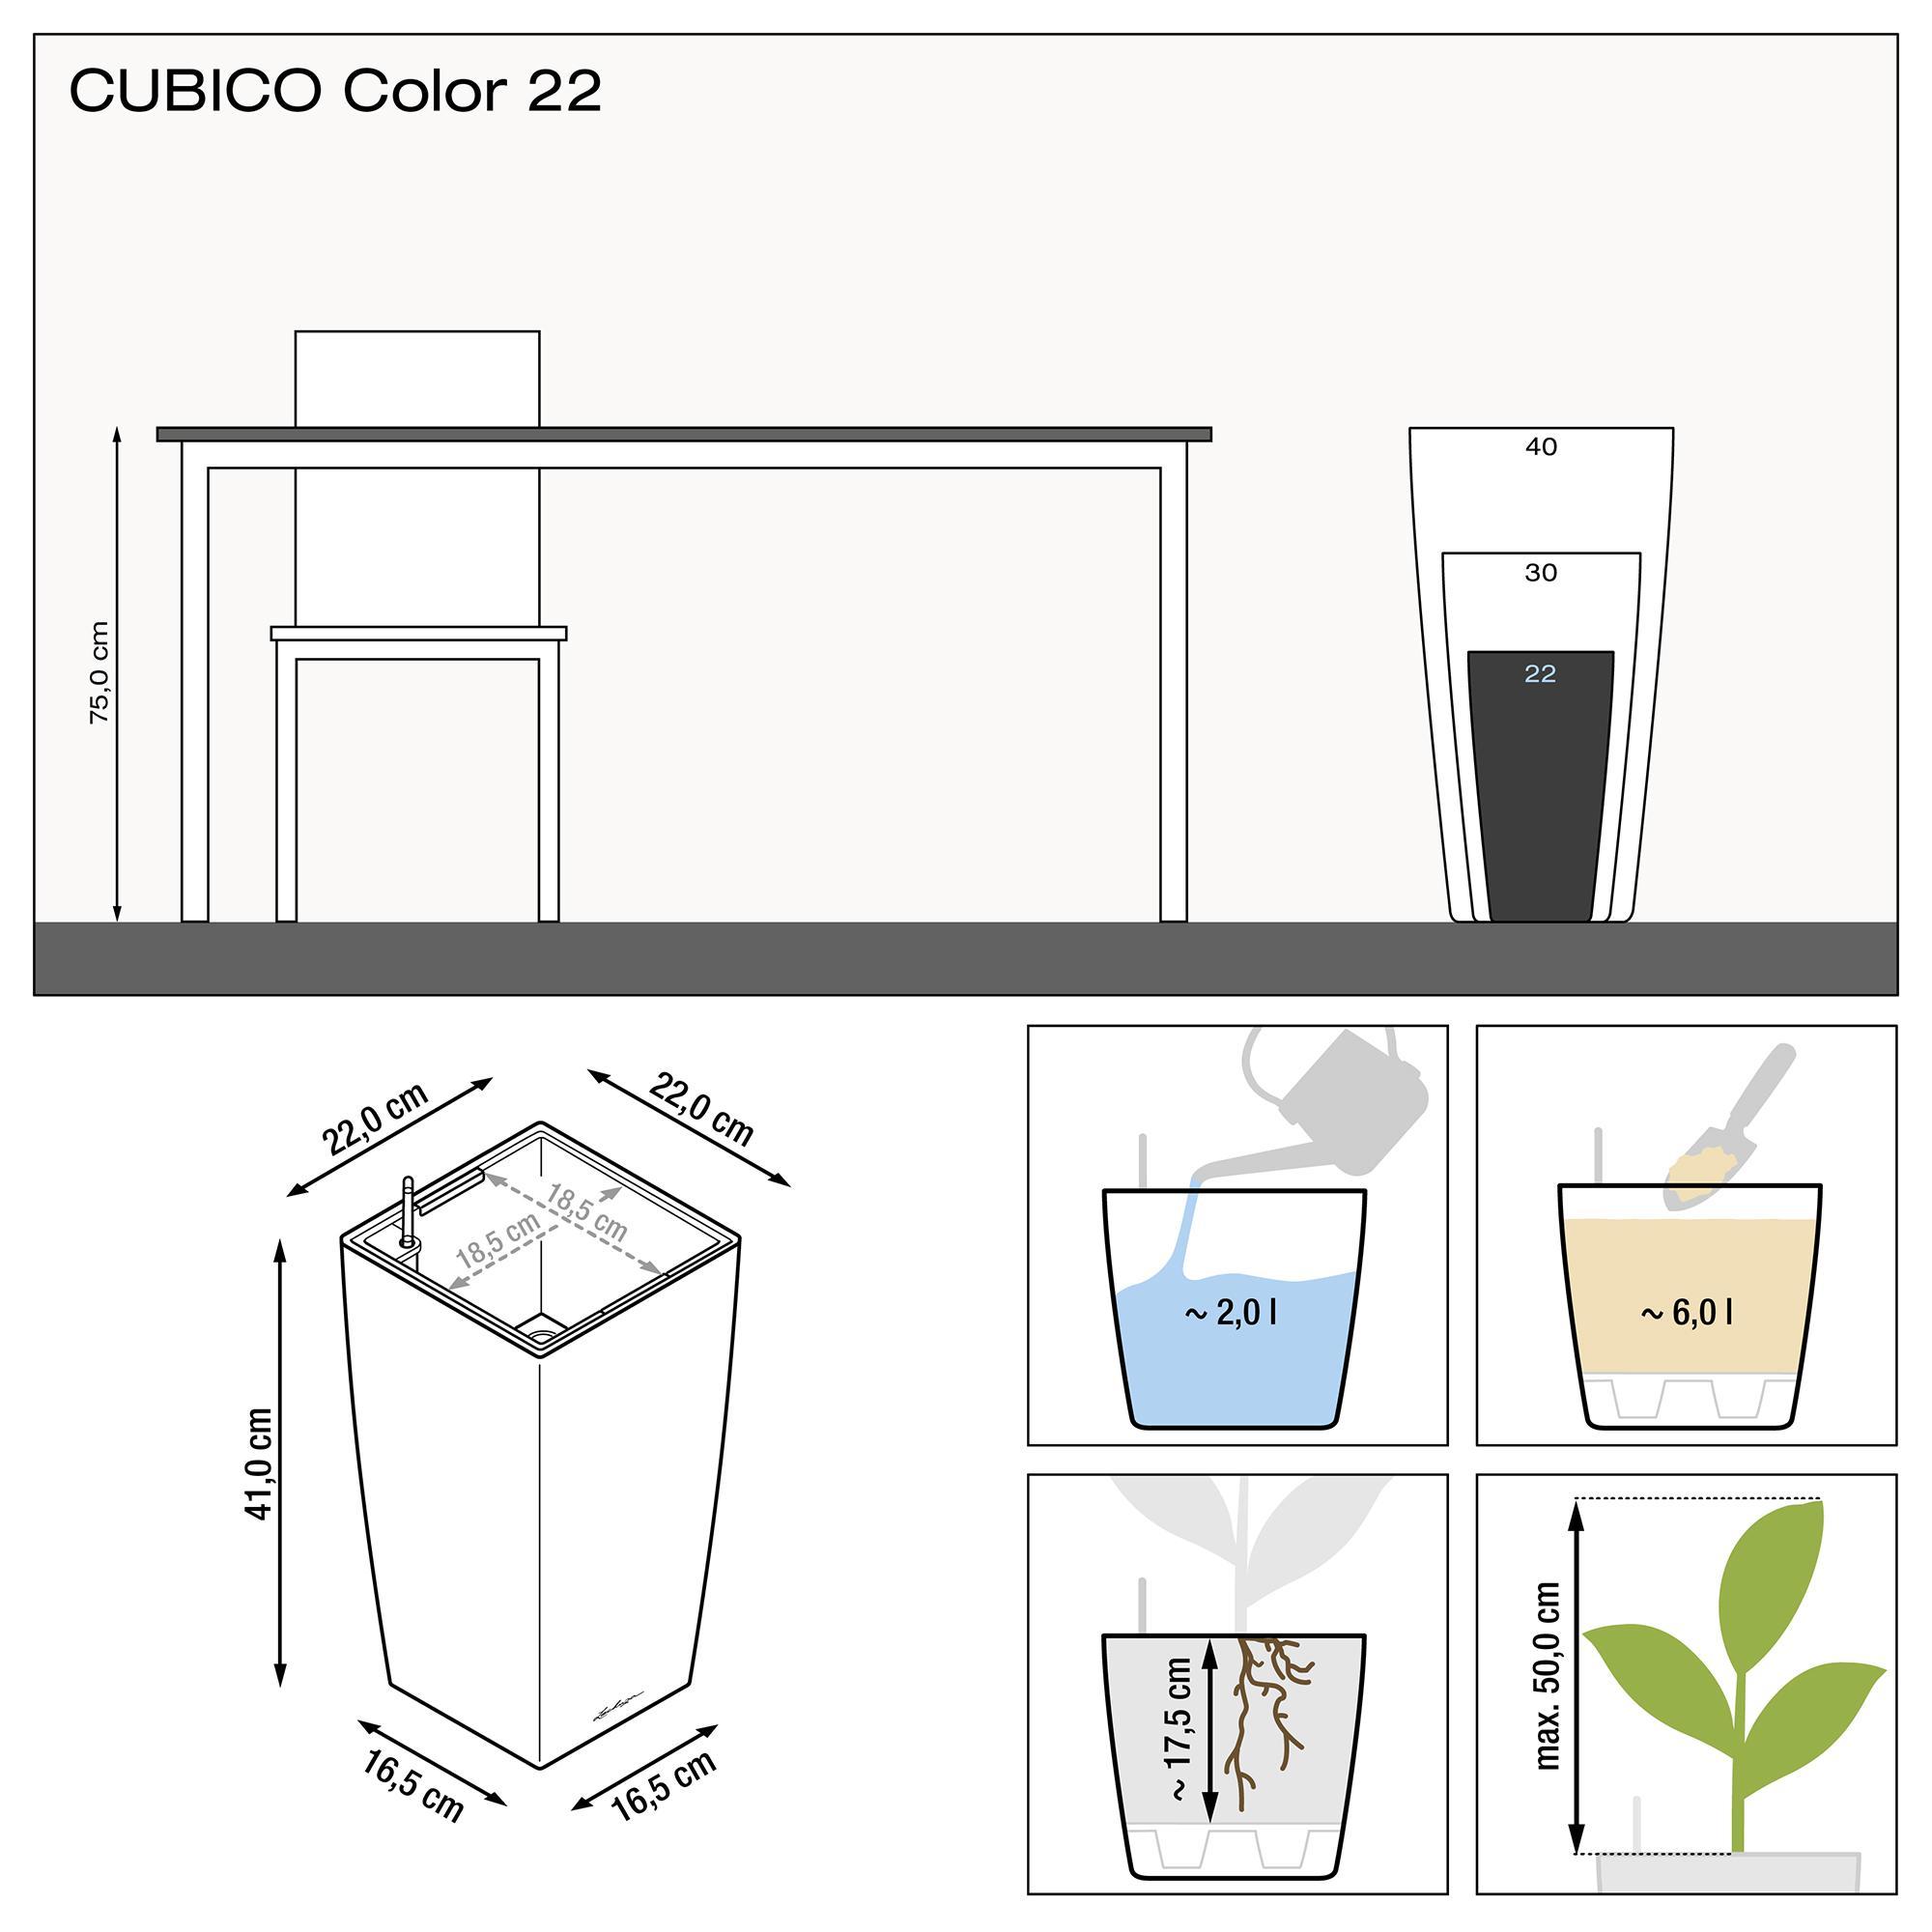 le_cubico-color22_product_addi_nz